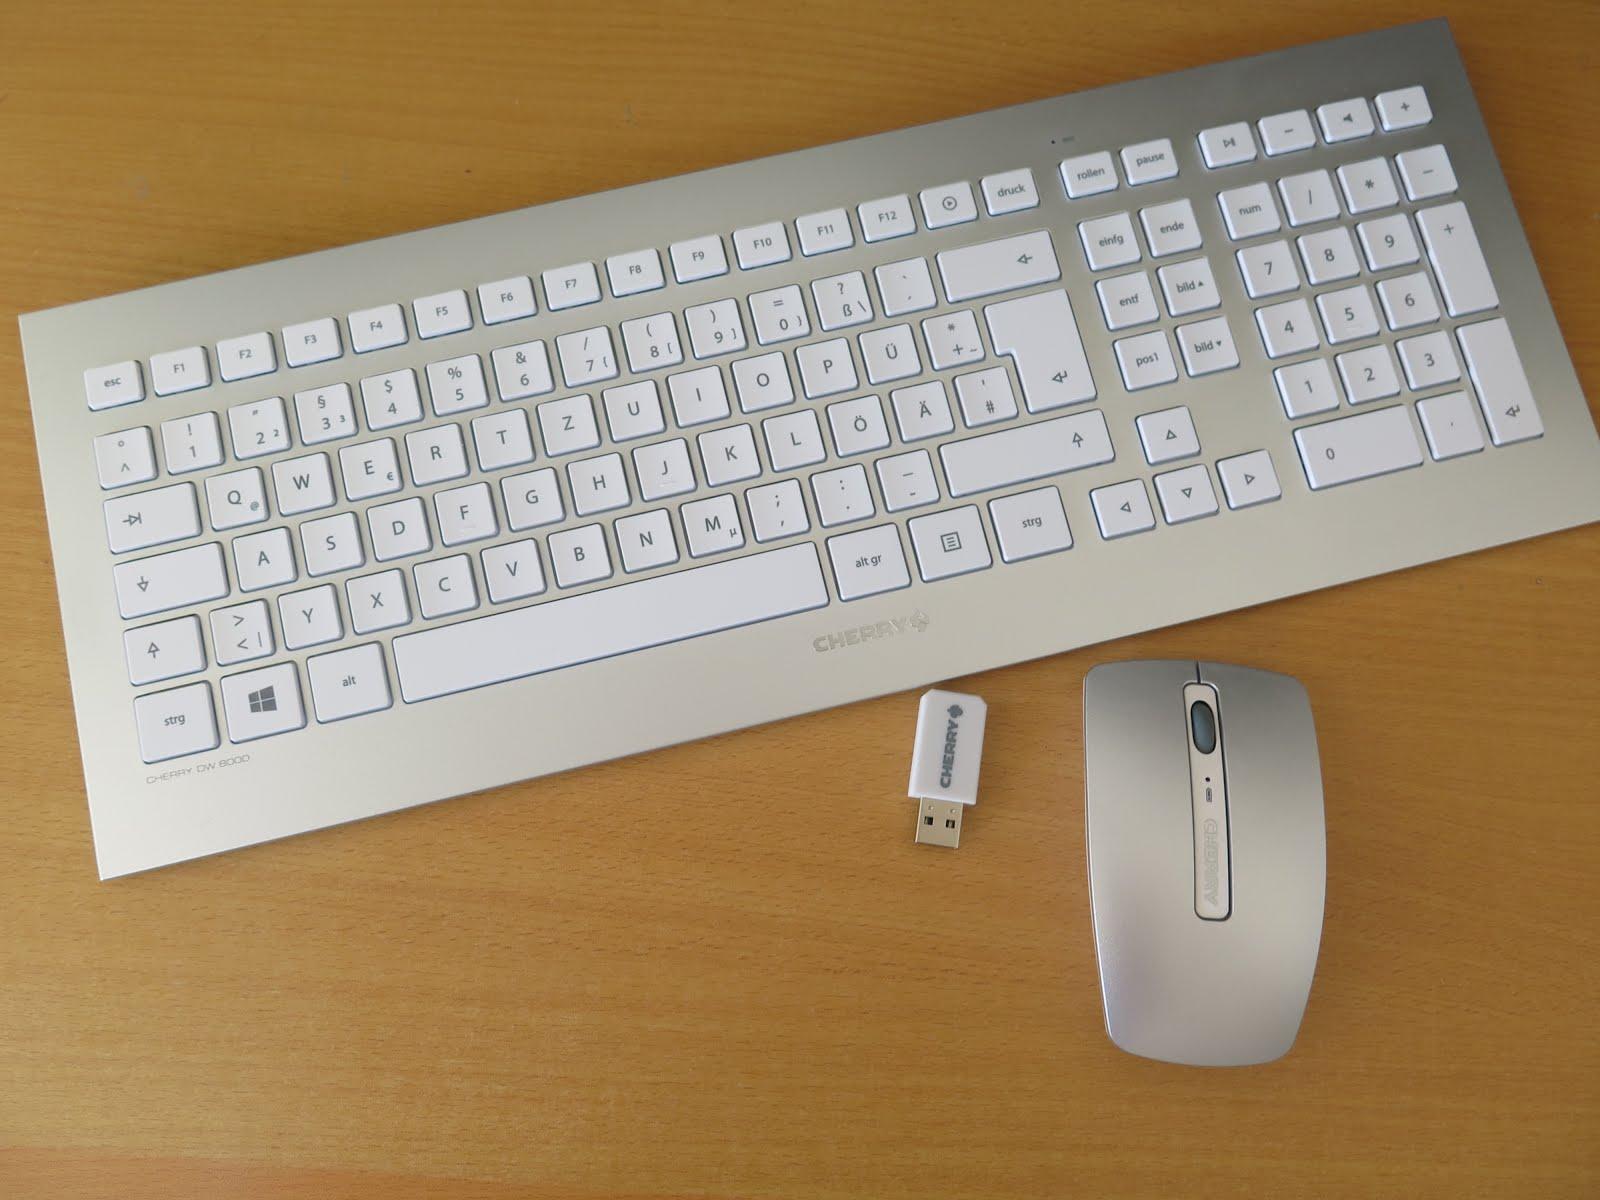 cherry dw 8000 tastatur im test tante reenes testfamilie. Black Bedroom Furniture Sets. Home Design Ideas